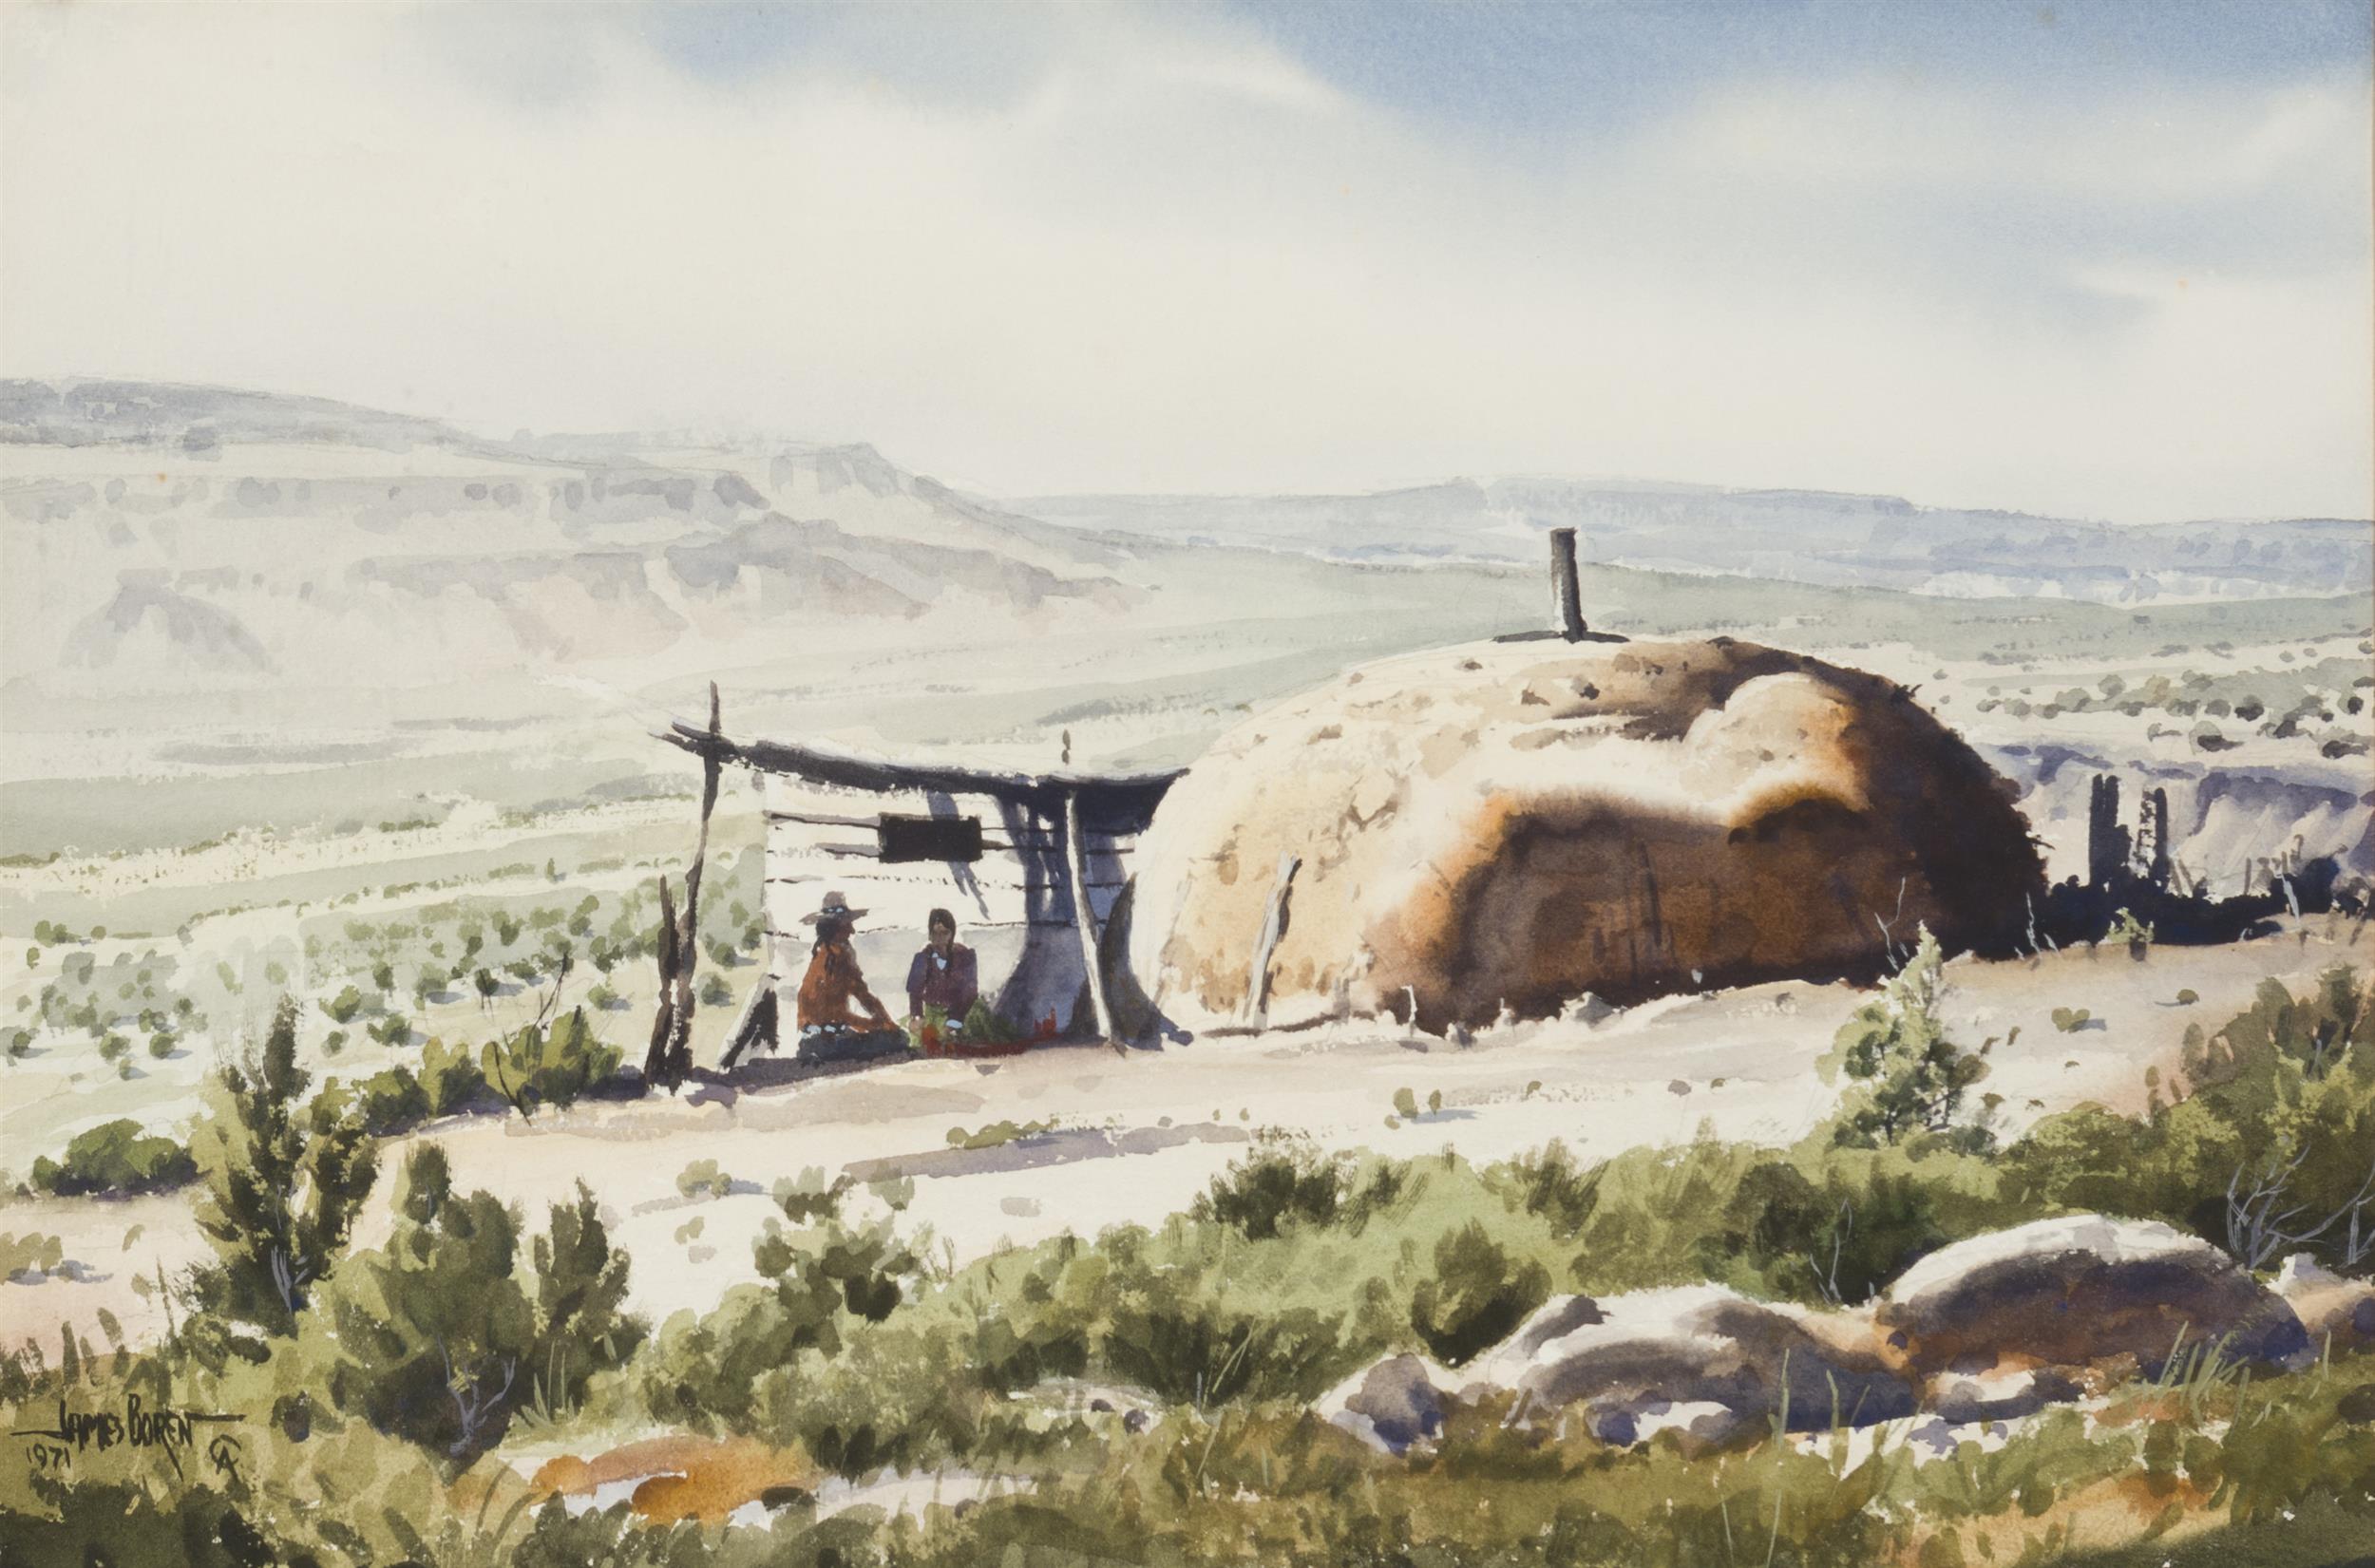 "James Erwin Boren, (1921-1990 Clifton, TX), ""Hogan,"" 1971, Watercolor on paper under glass, Sight: 14.5"" H x 21.5"" W"